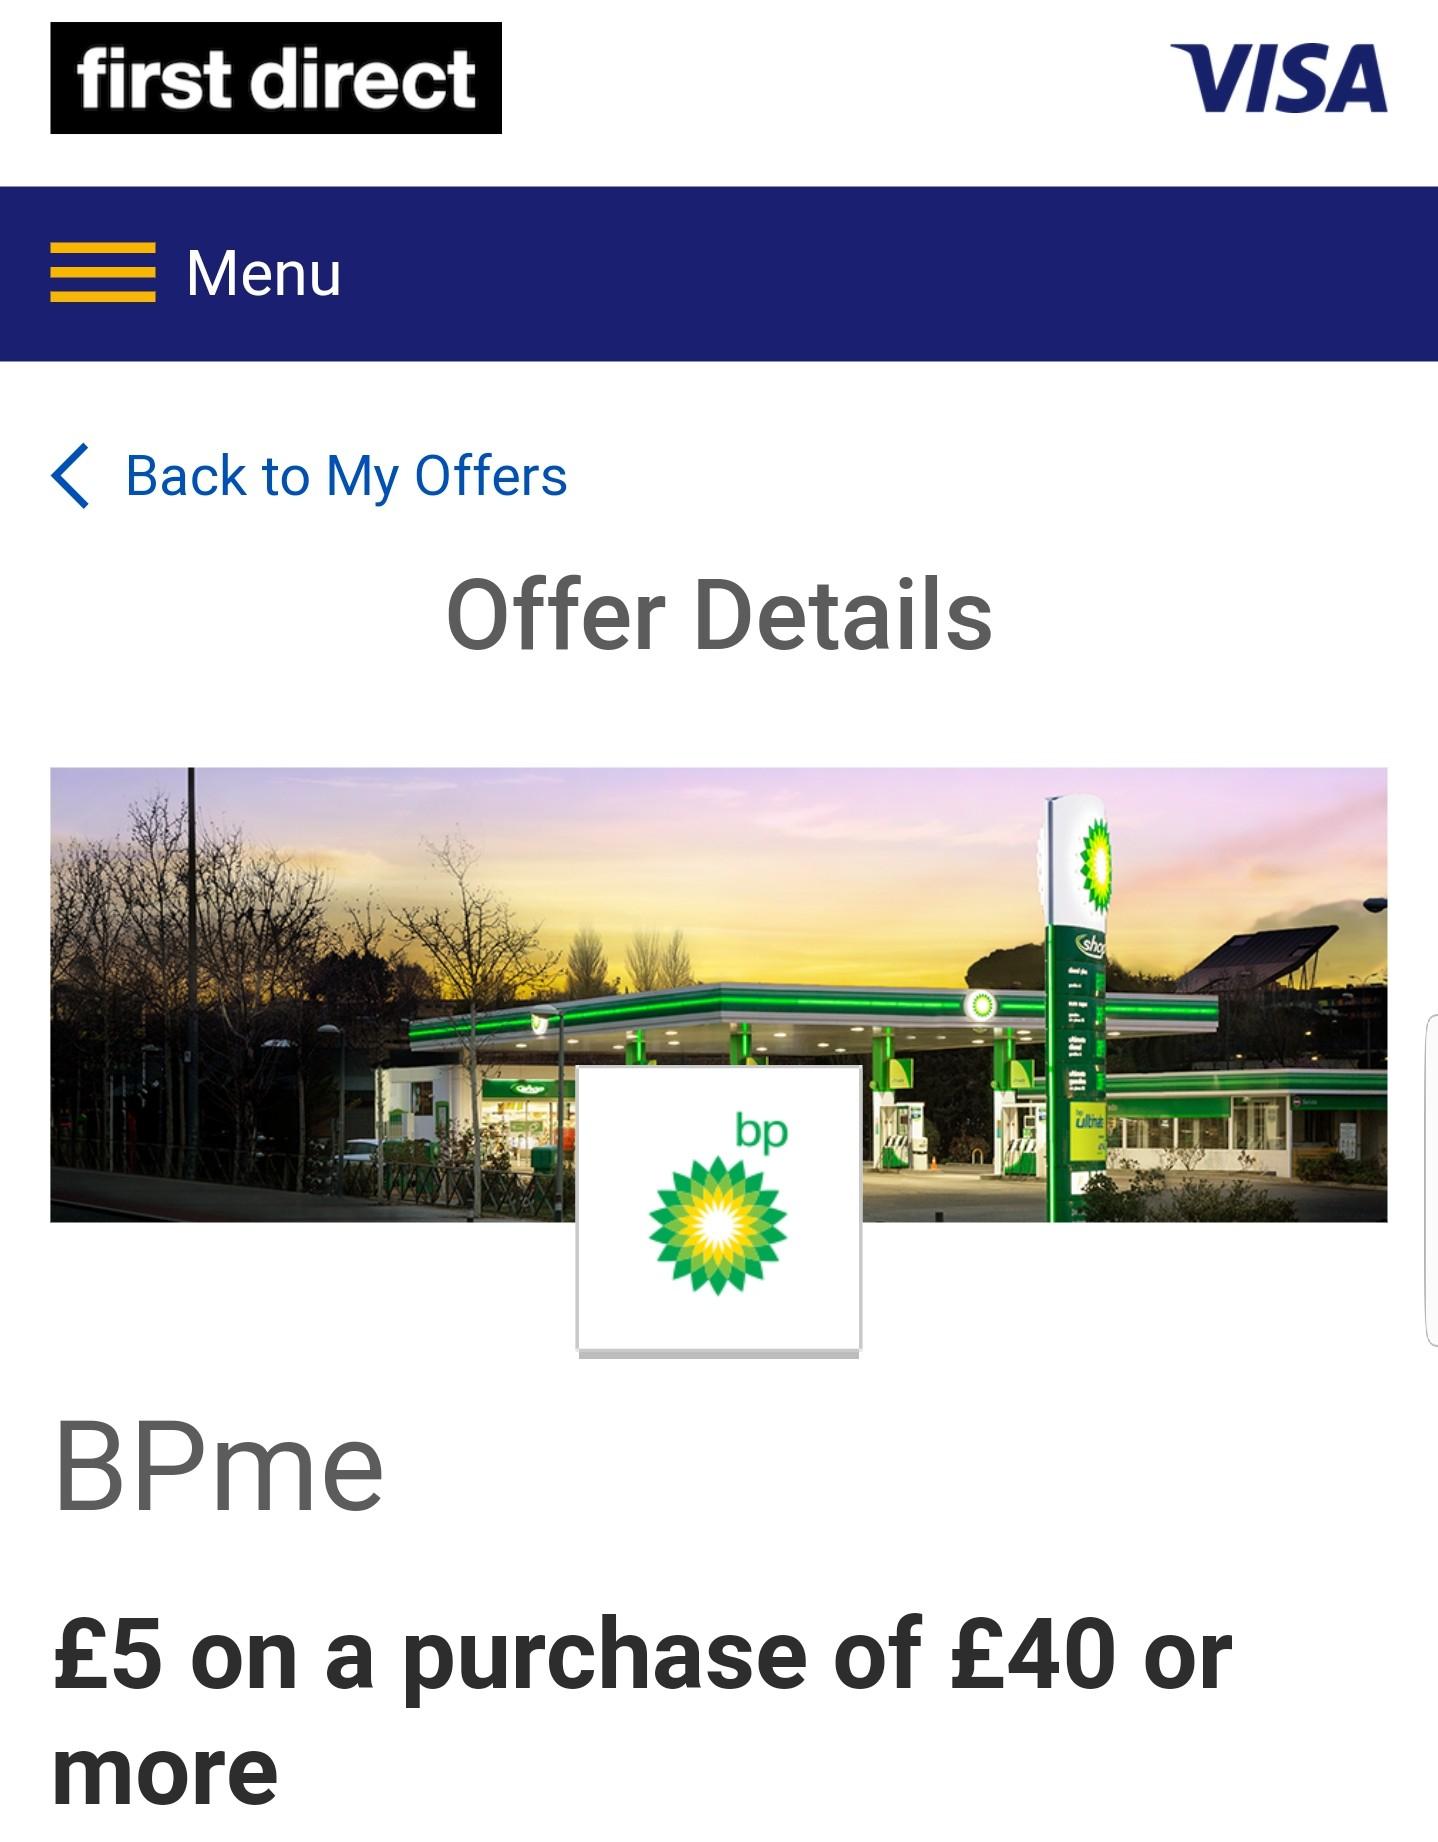 BP fuel £35 for £40 worths via FirstDirect Visa Offers cashback